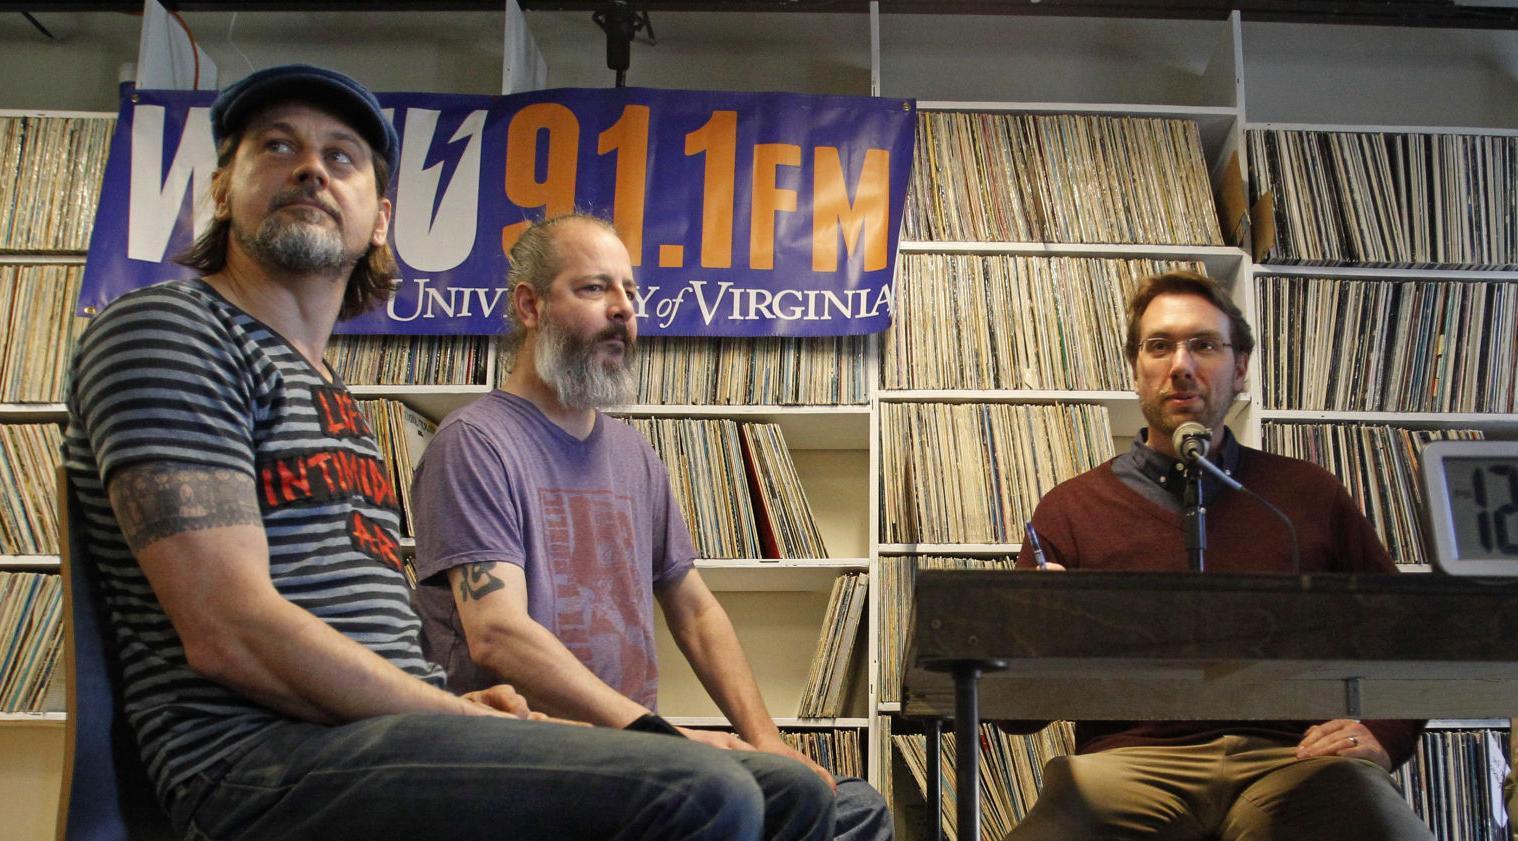 Spinning records: 82 DJs celebrate new WTJU studio